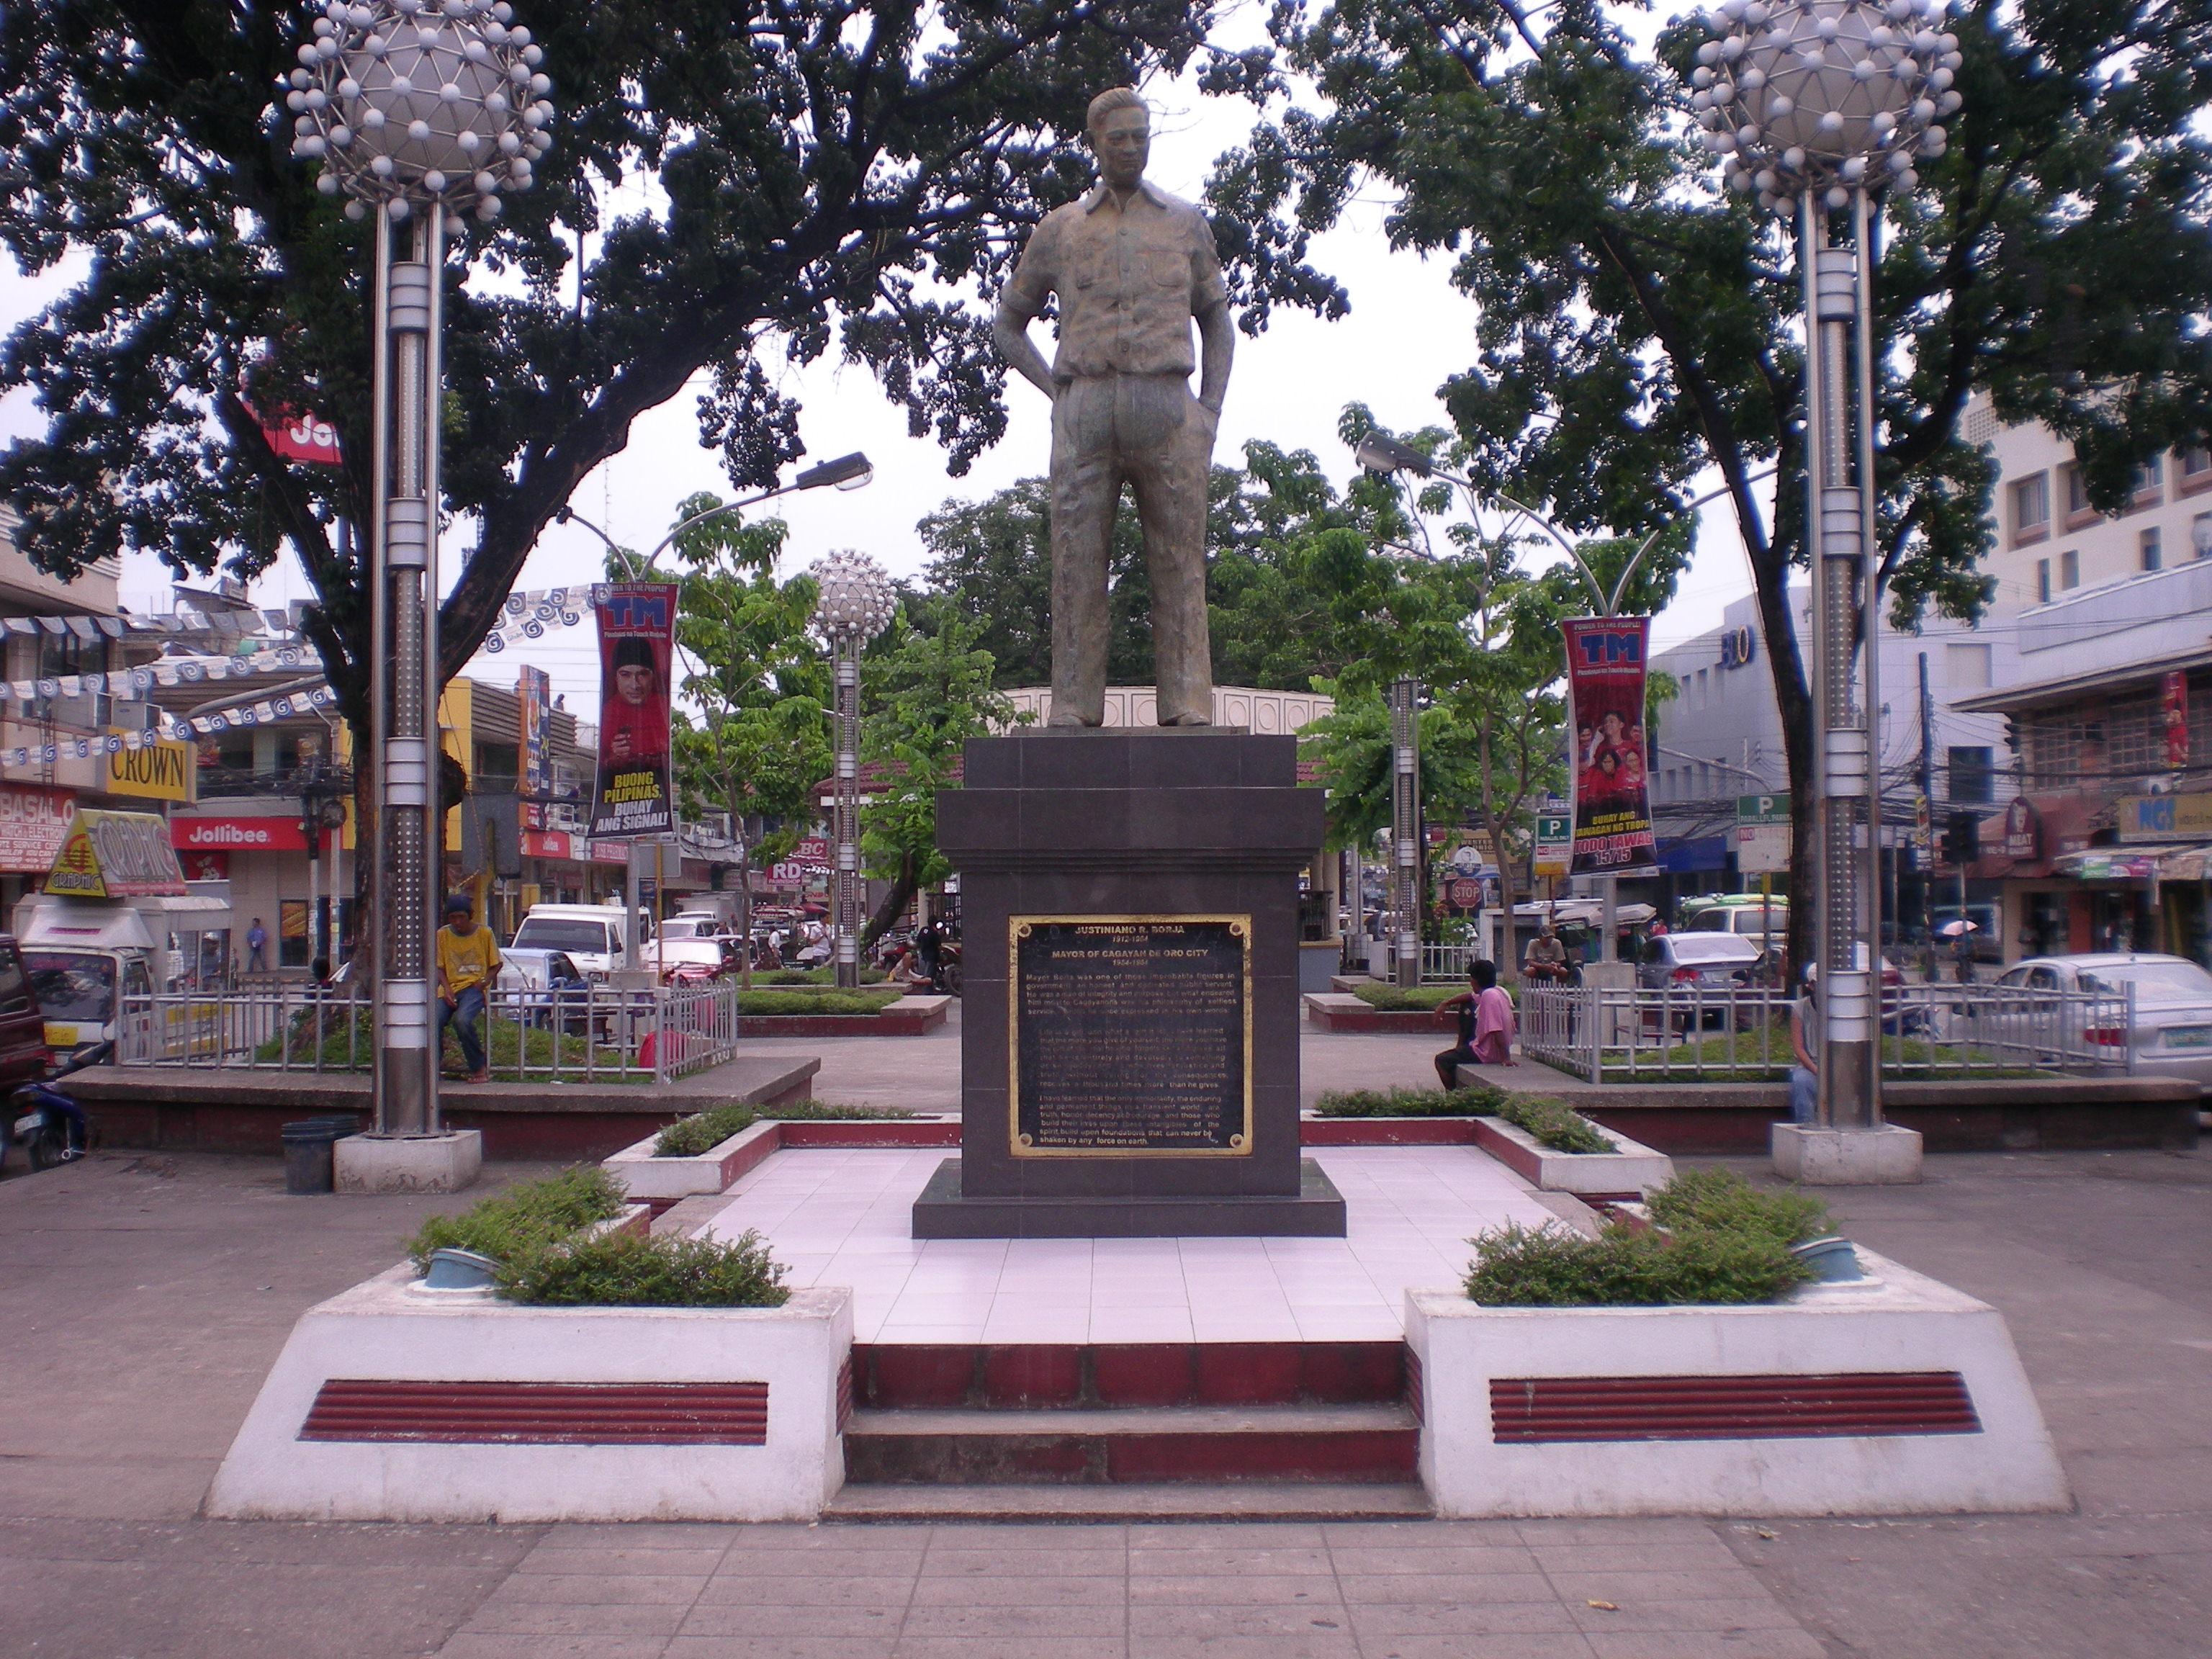 Sights & Sounds of Cagayan de Oro - The streets of Cagayan de Oro